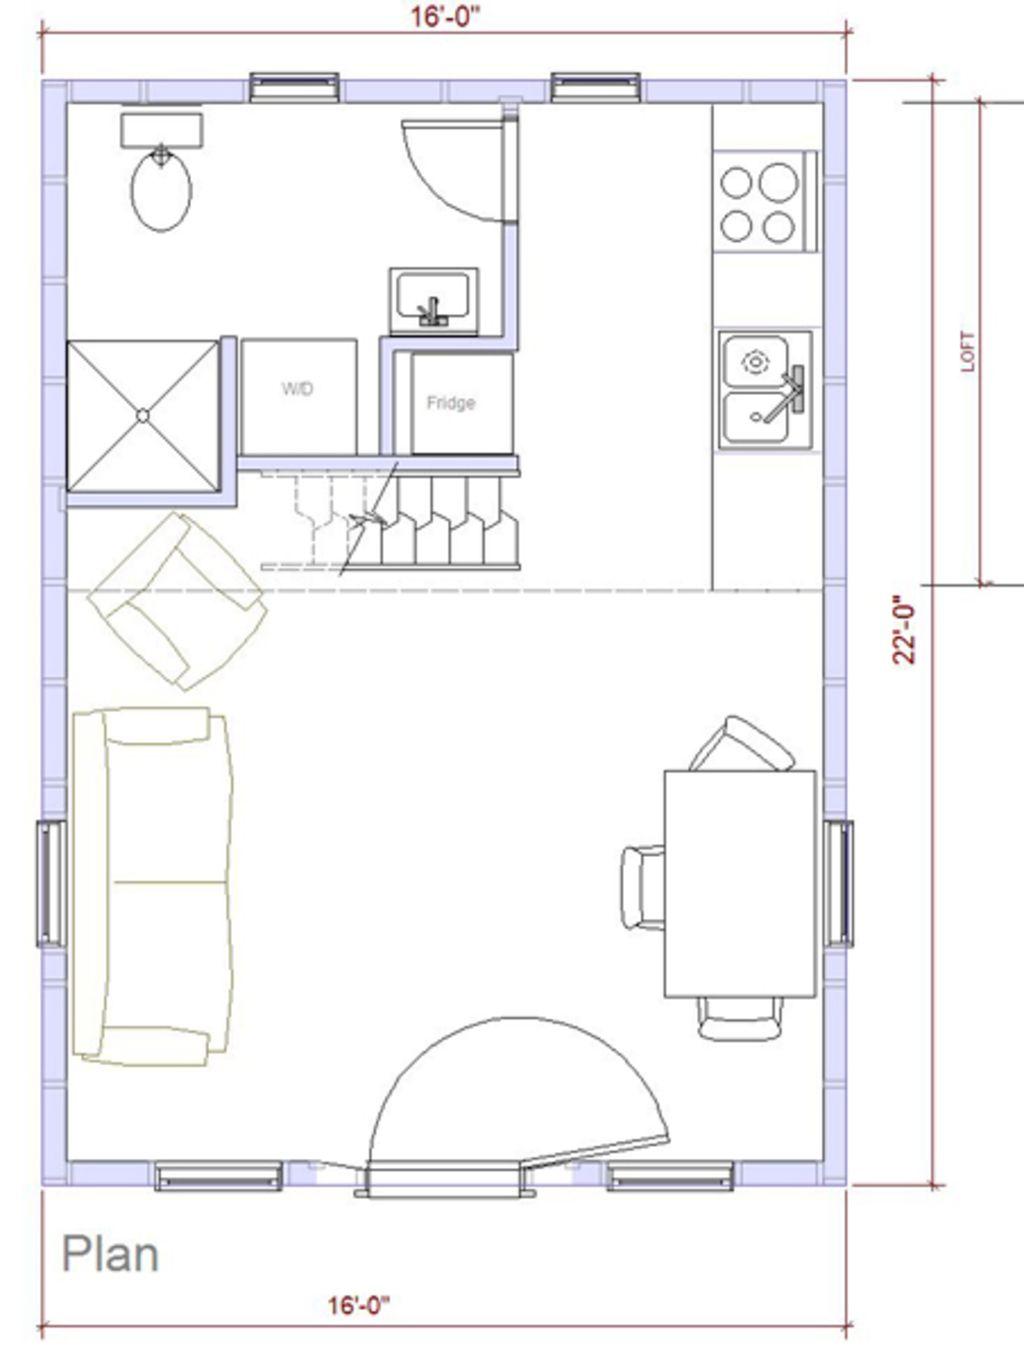 Modern Style House Plan 1 Beds 1 Baths 320 Sq Ft Plan 890 2 House Plans House Plan With Loft Modern Style House Plans